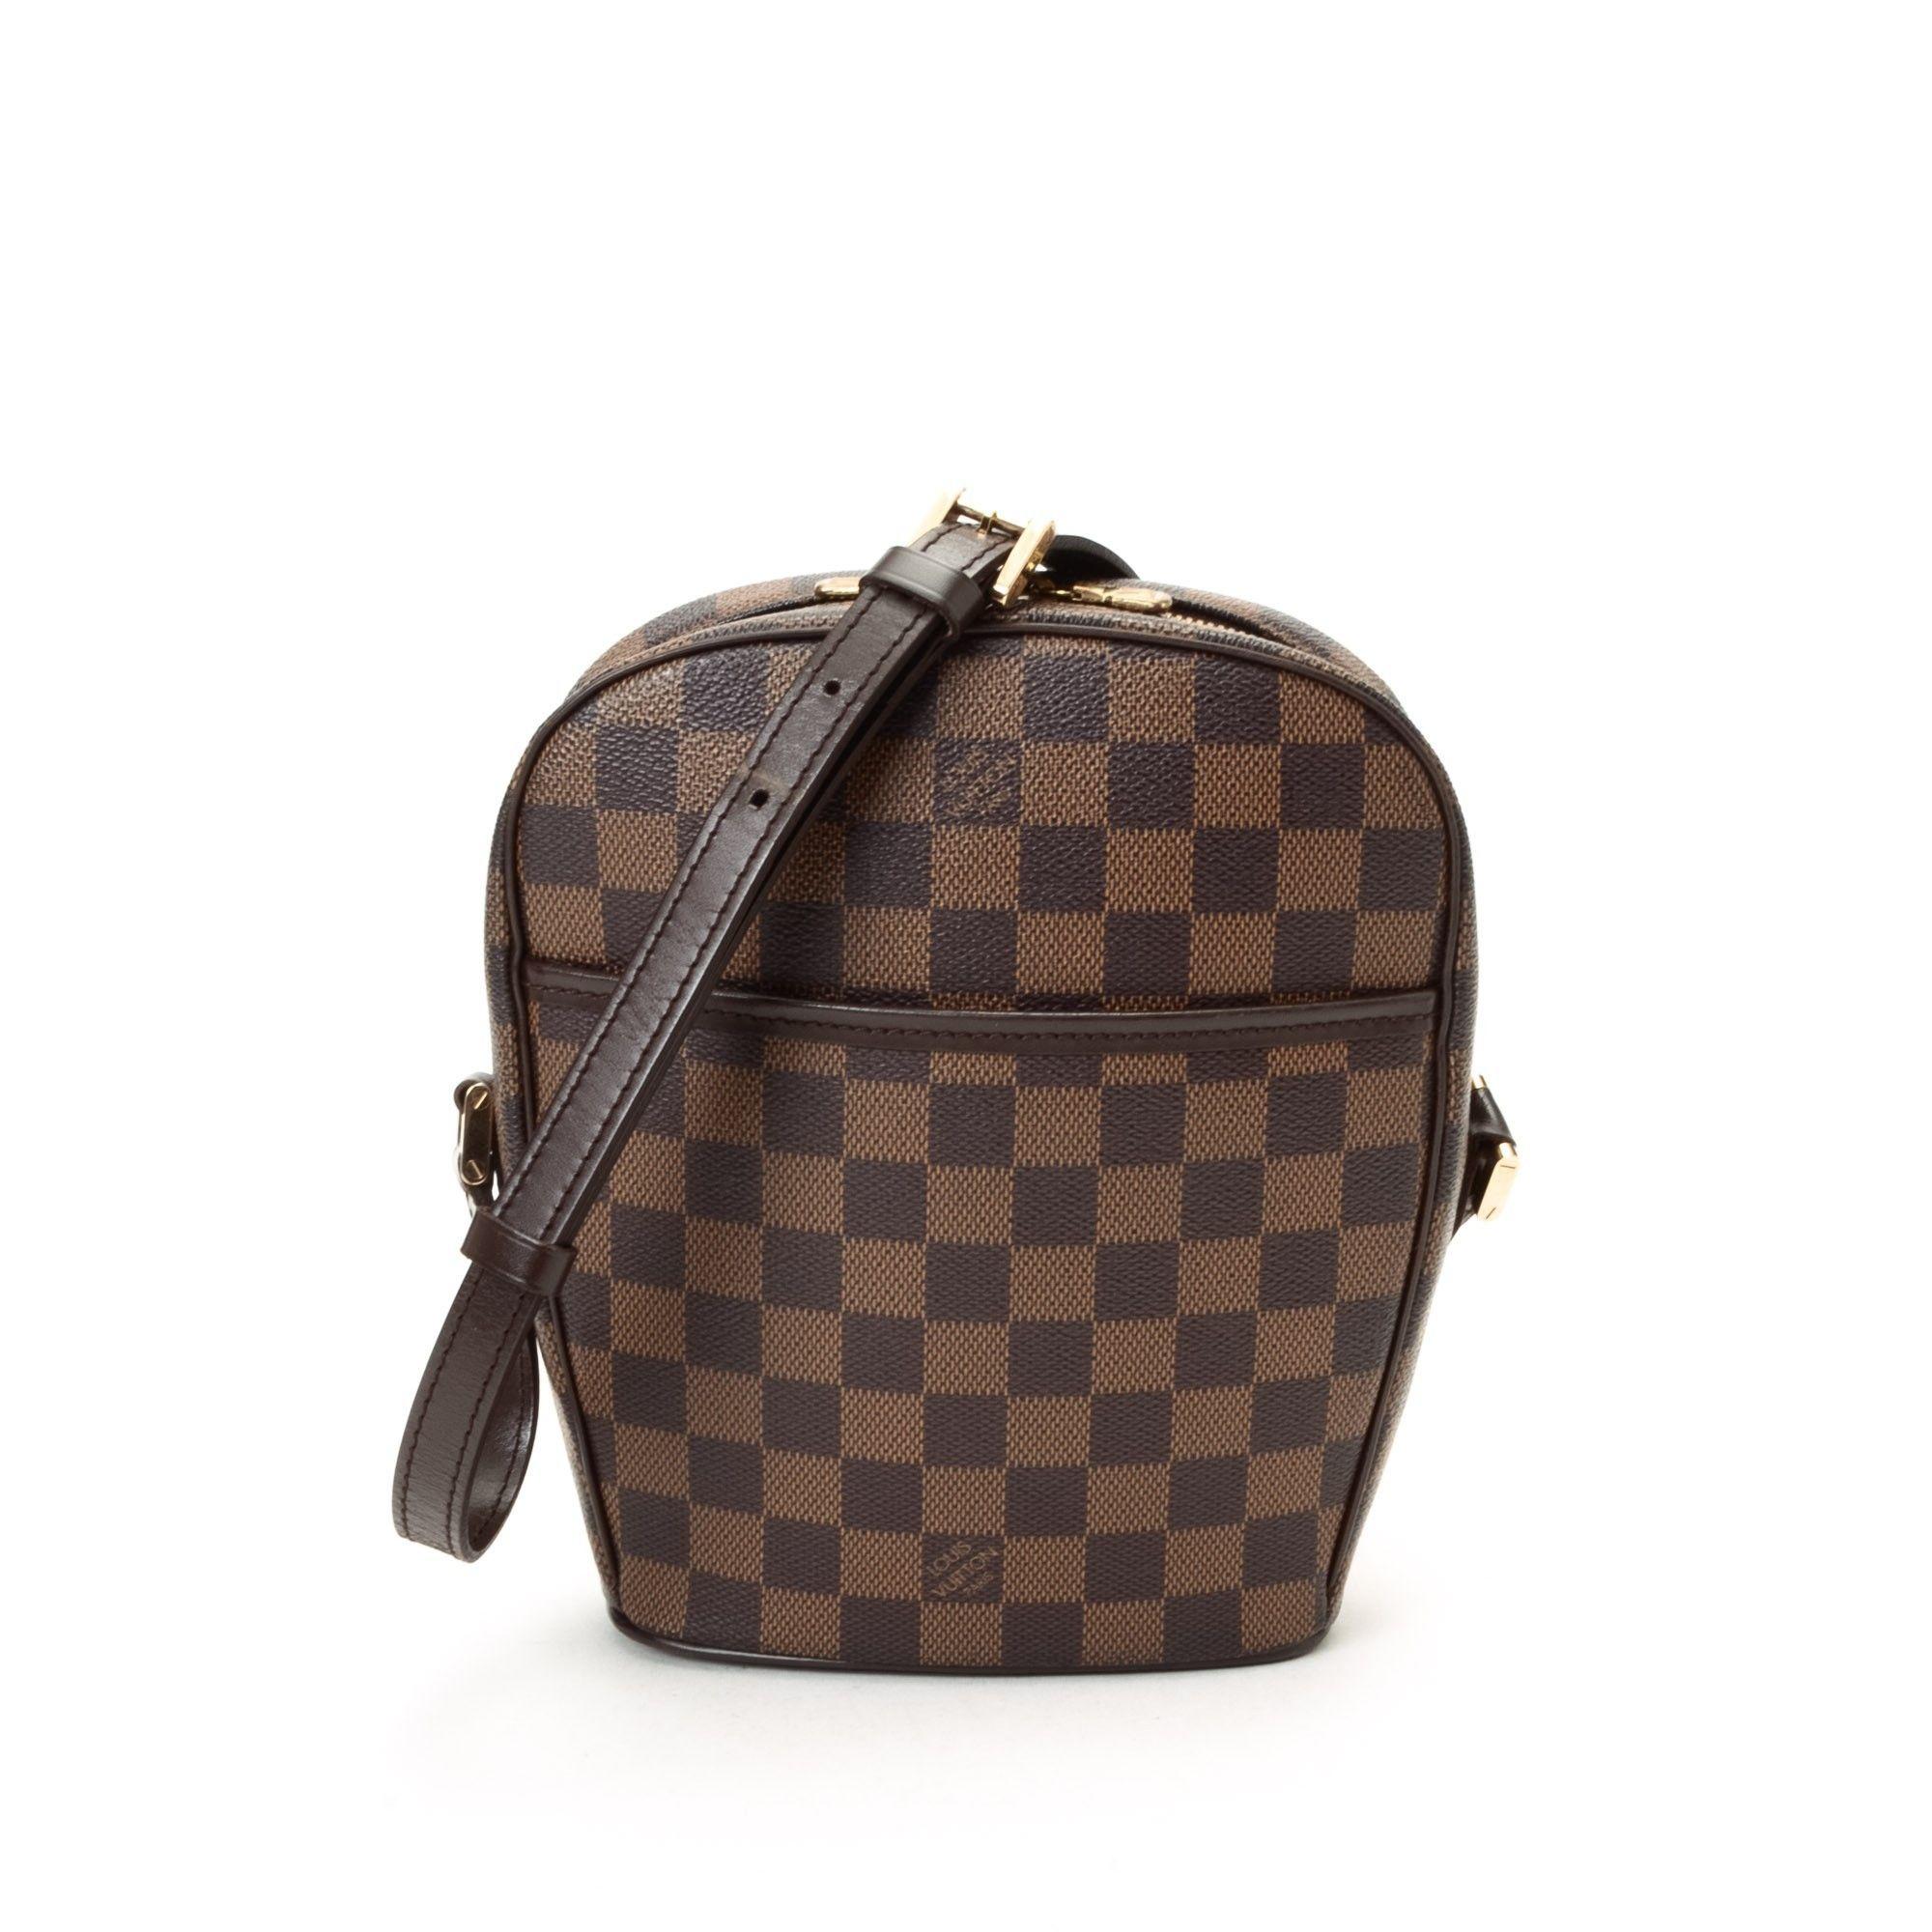 9ad1bfbee635 Louis Vuitton Ipanema PM Damier Ebene Brown Coated Canvas Messenger   Crossbody  Bag